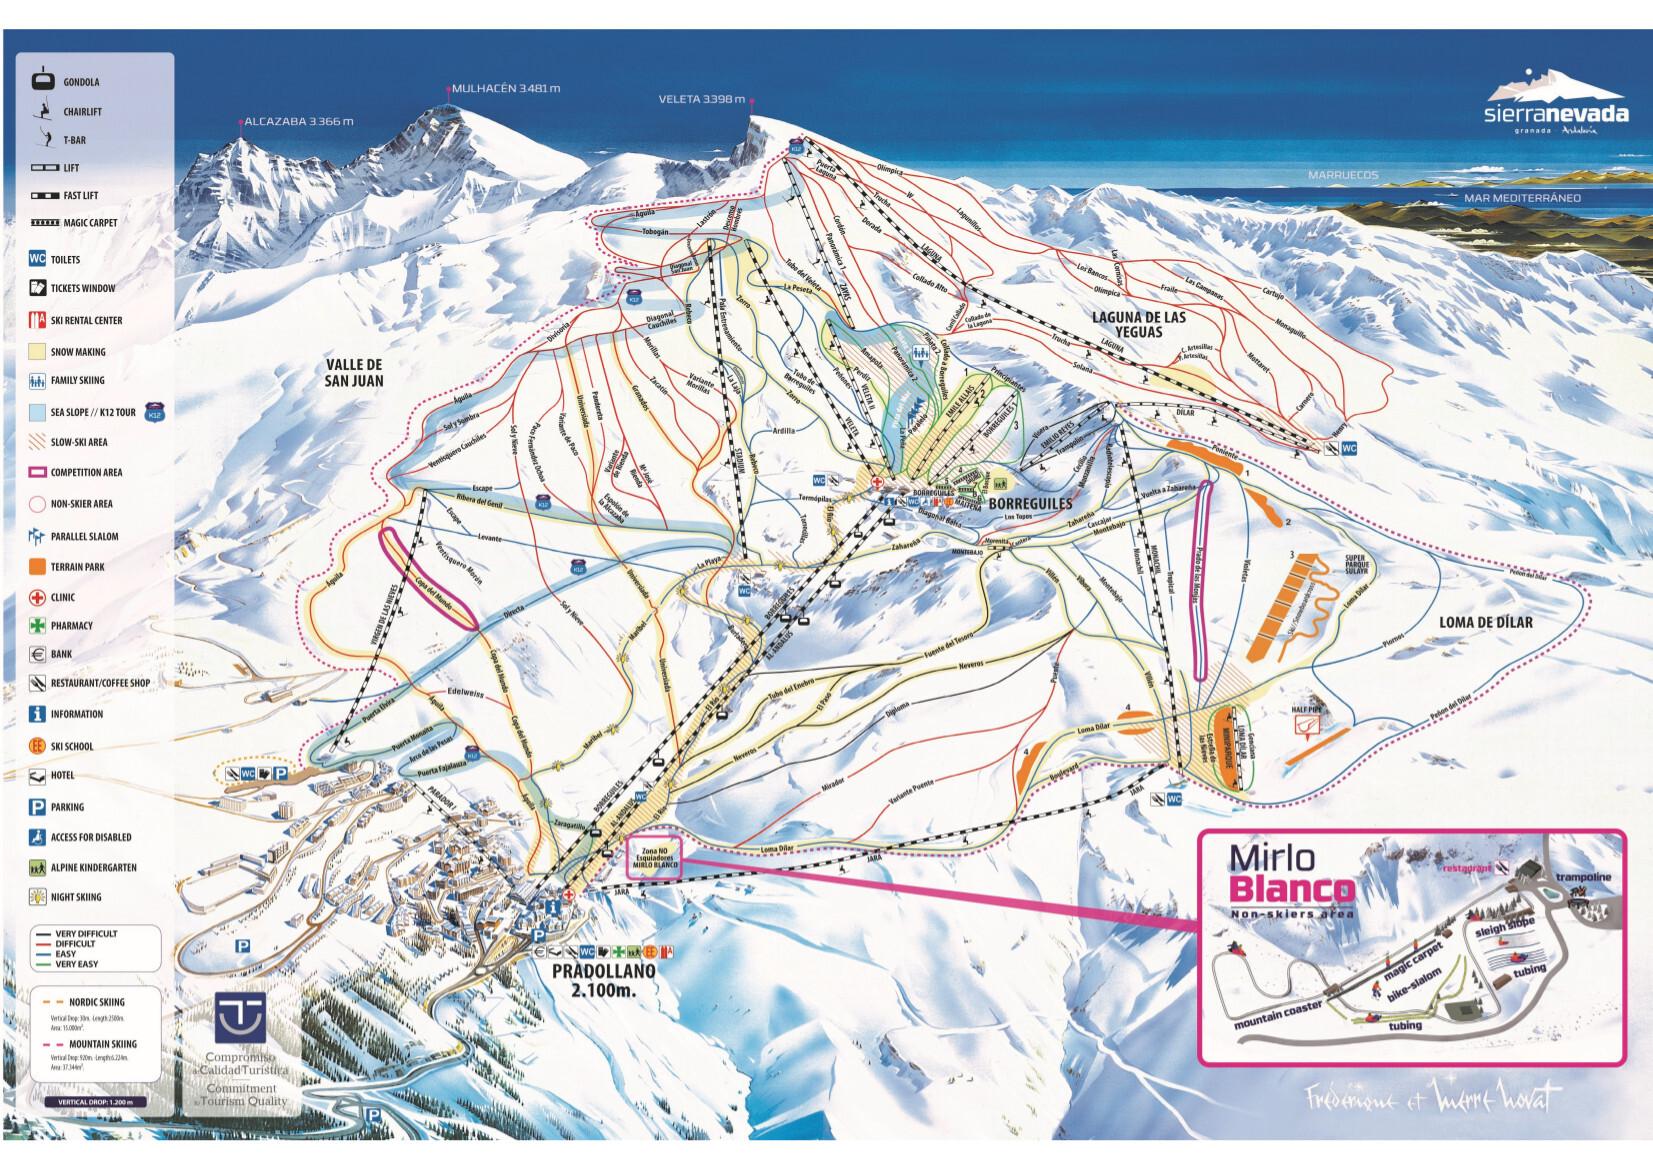 mapa de espanha serra nevada Sierra Nevada Mapa da pista / Mapa de trilha mapa de espanha serra nevada